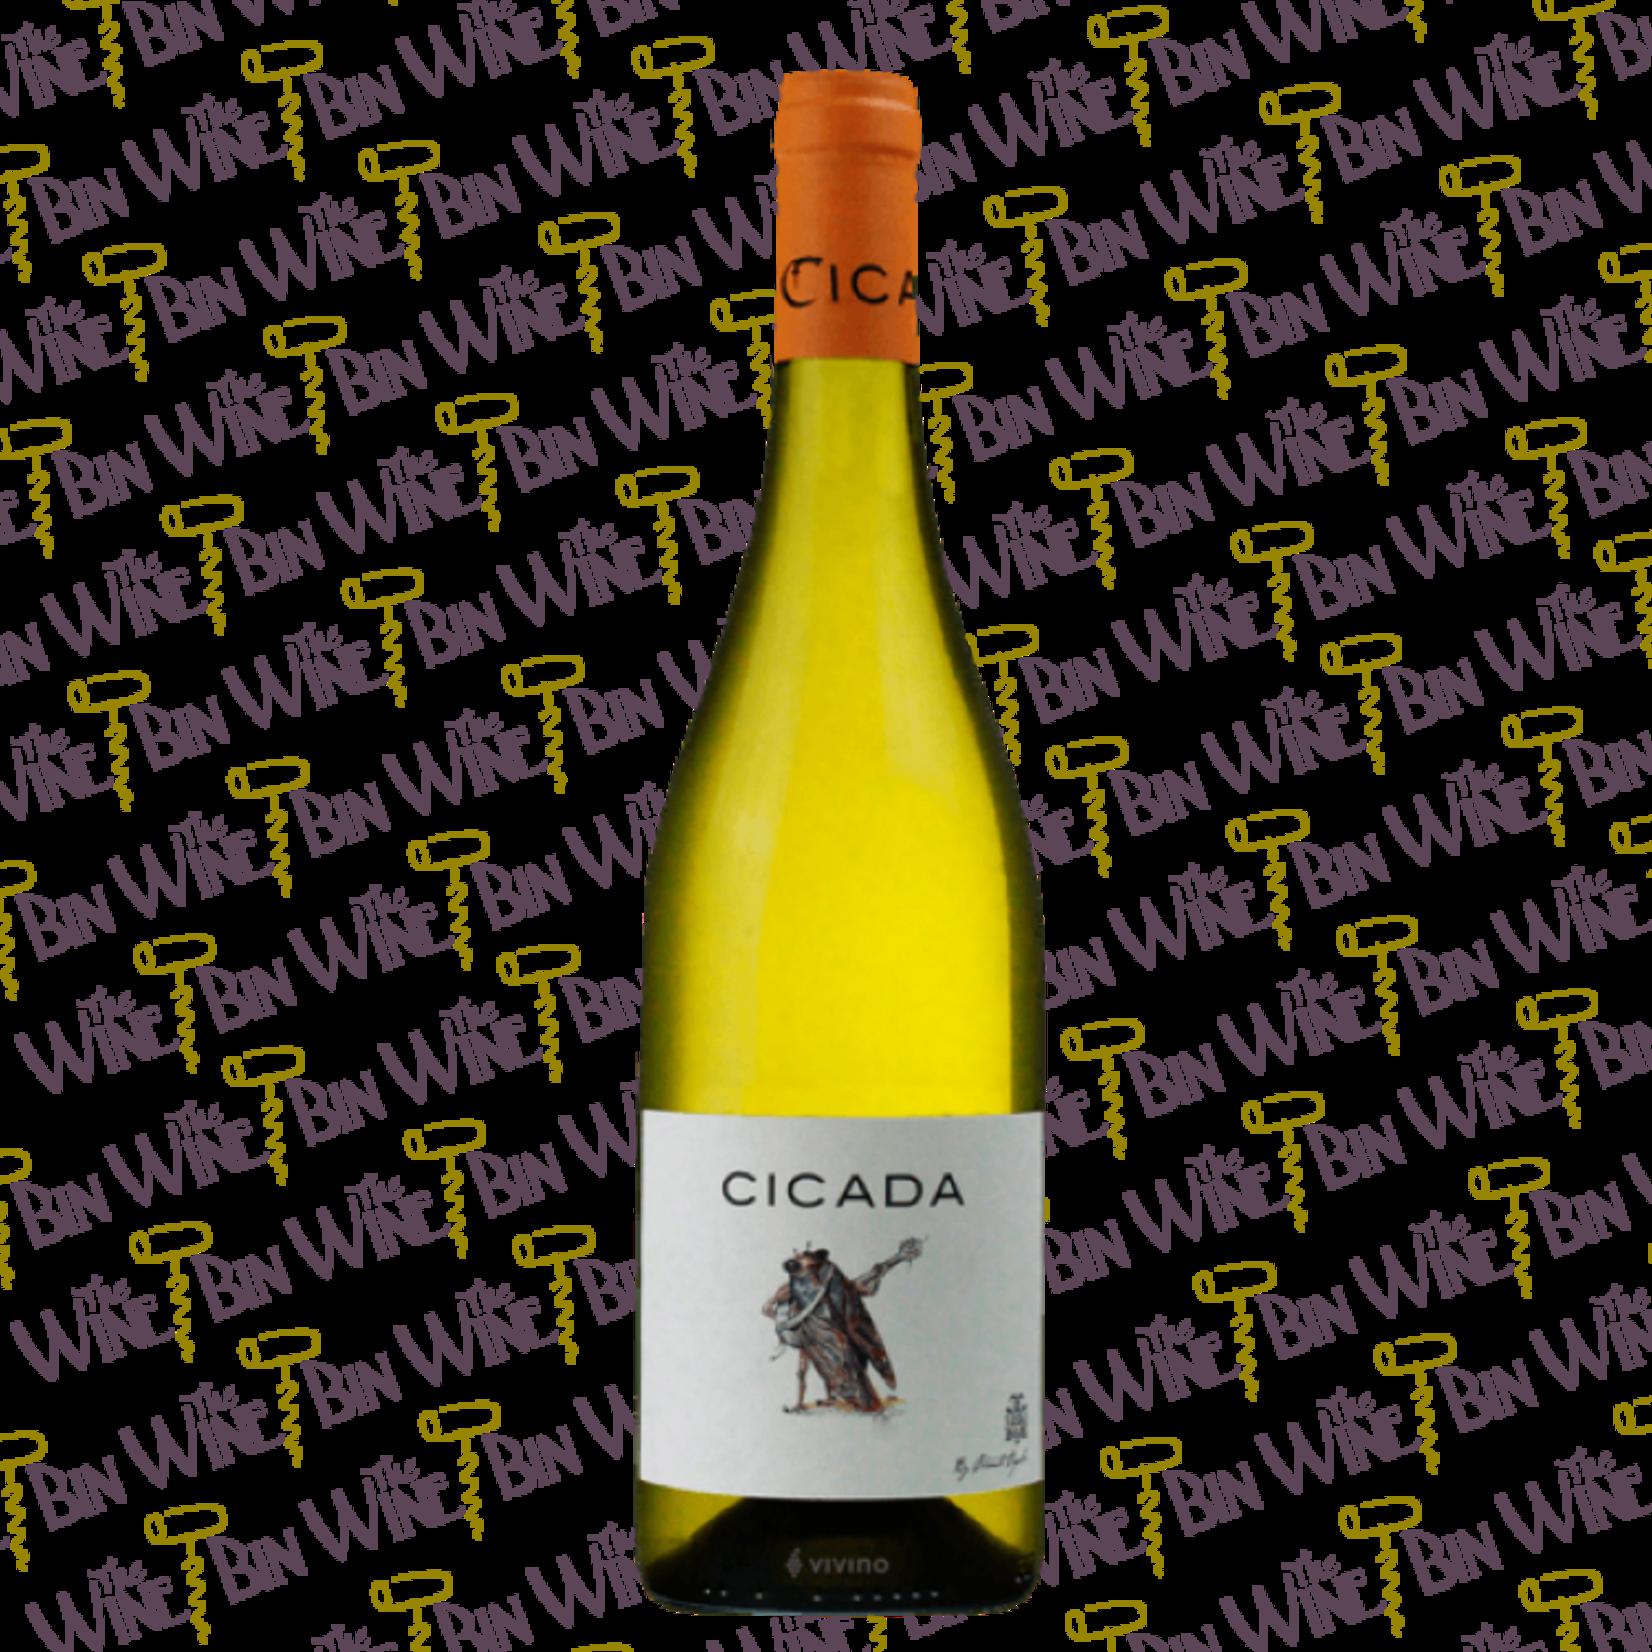 THE CICADA Cicada • Blanc Chante Cigale- .750L - Bottle